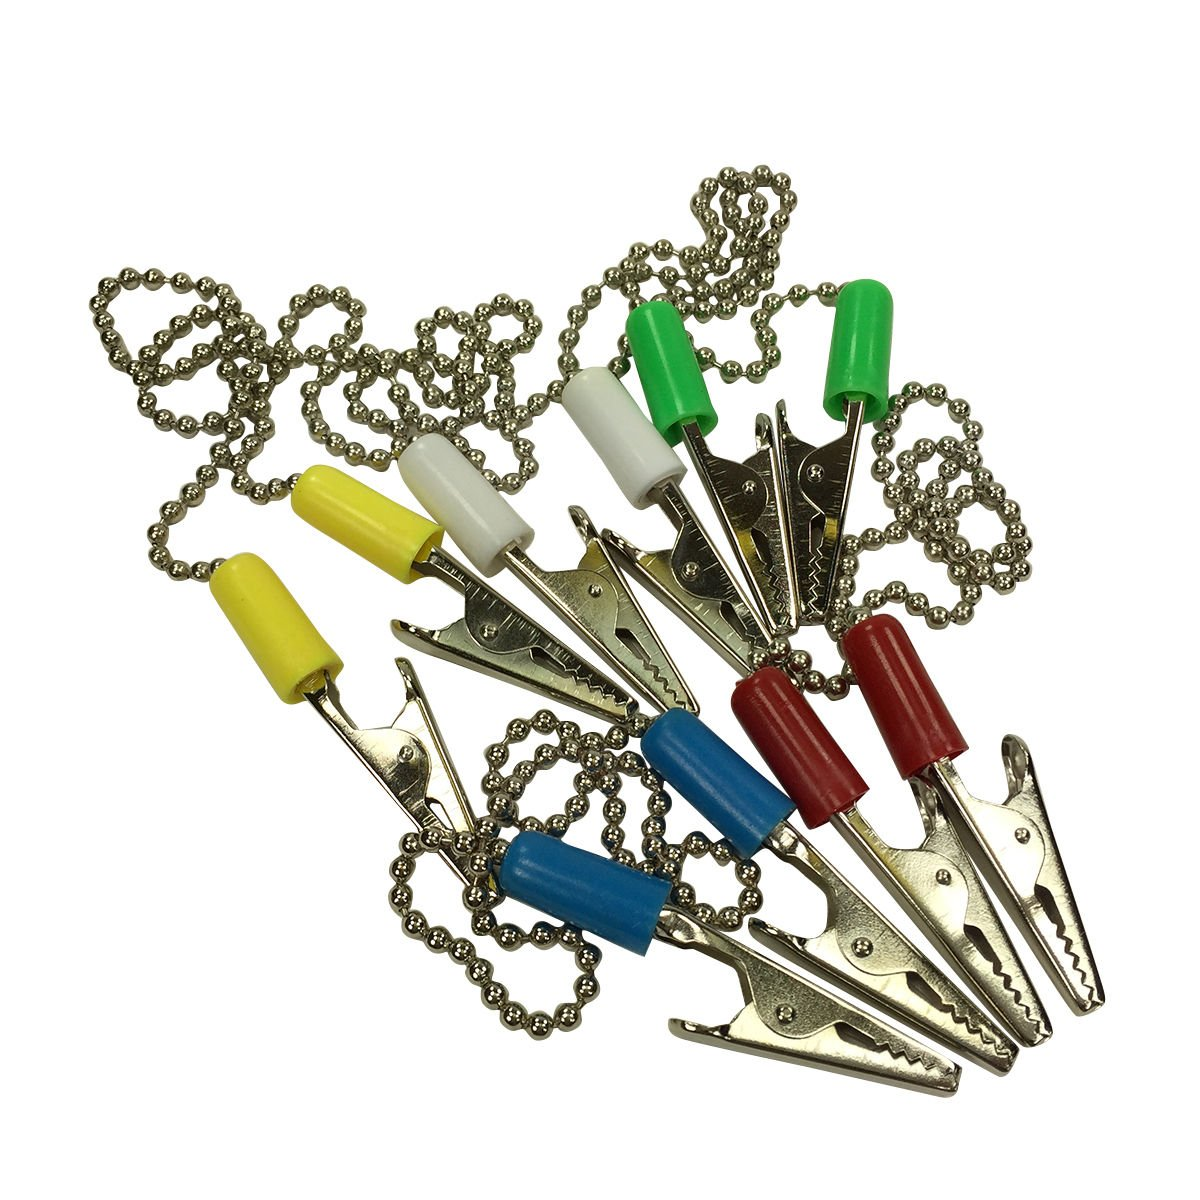 5* Dental Patient Bib Clips Chains Napkin Holder Flexible metal chain colorful